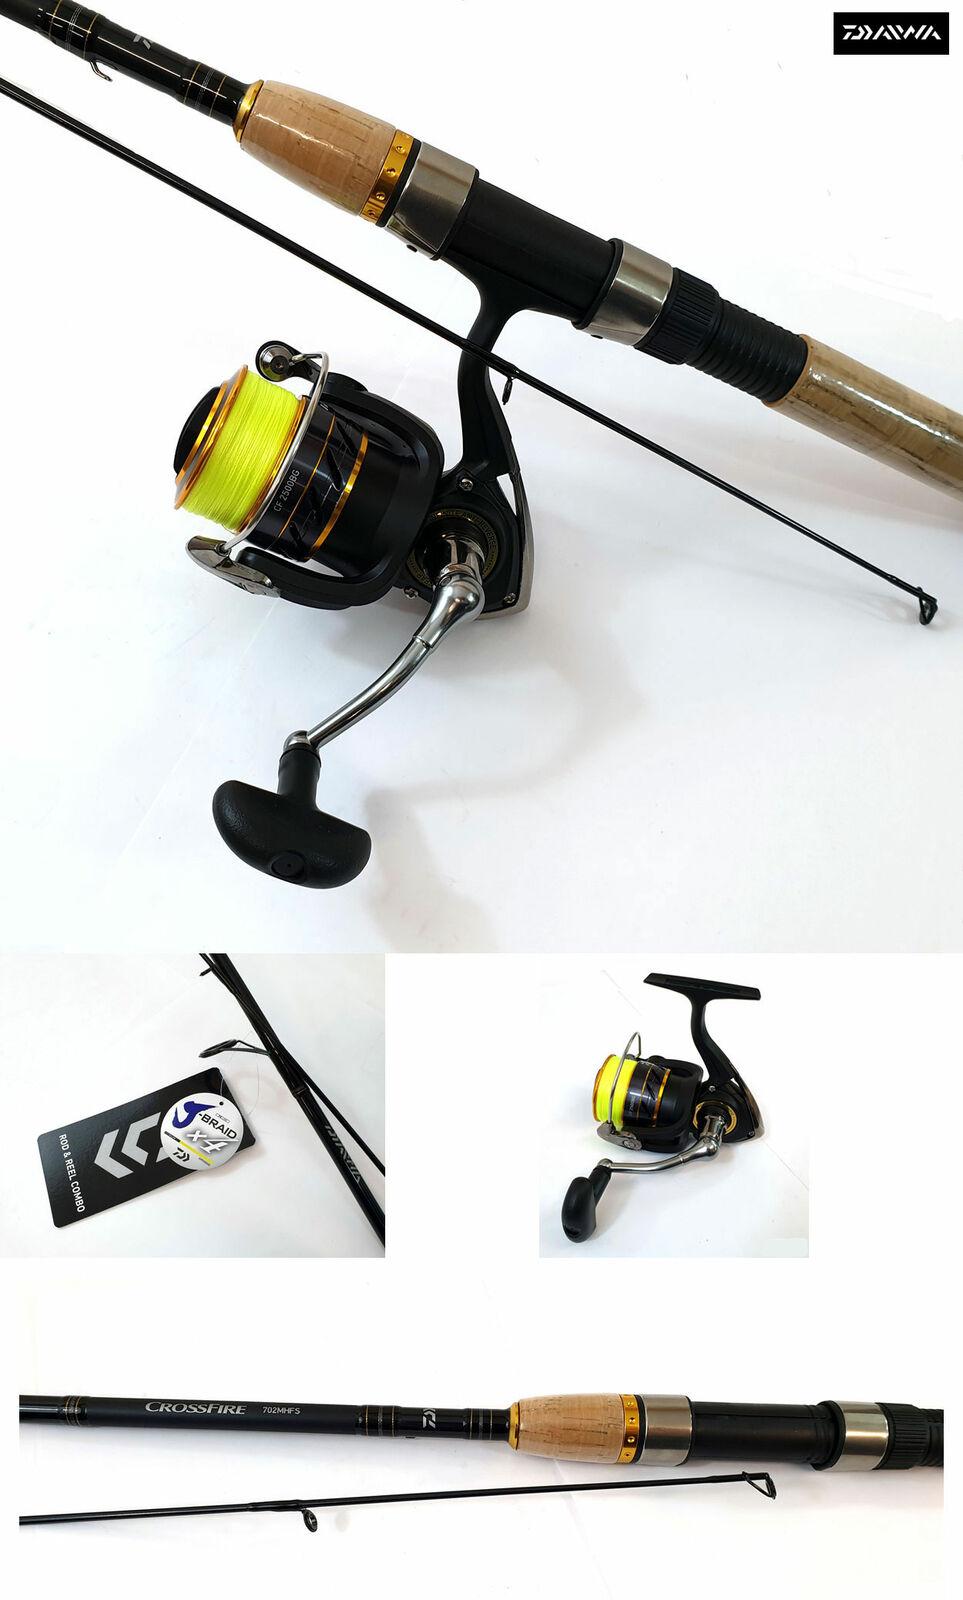 Daiwa Crossfire X Fishing Combo - 7ft Rod & Crossfire Reel - Loaded with J-Braid